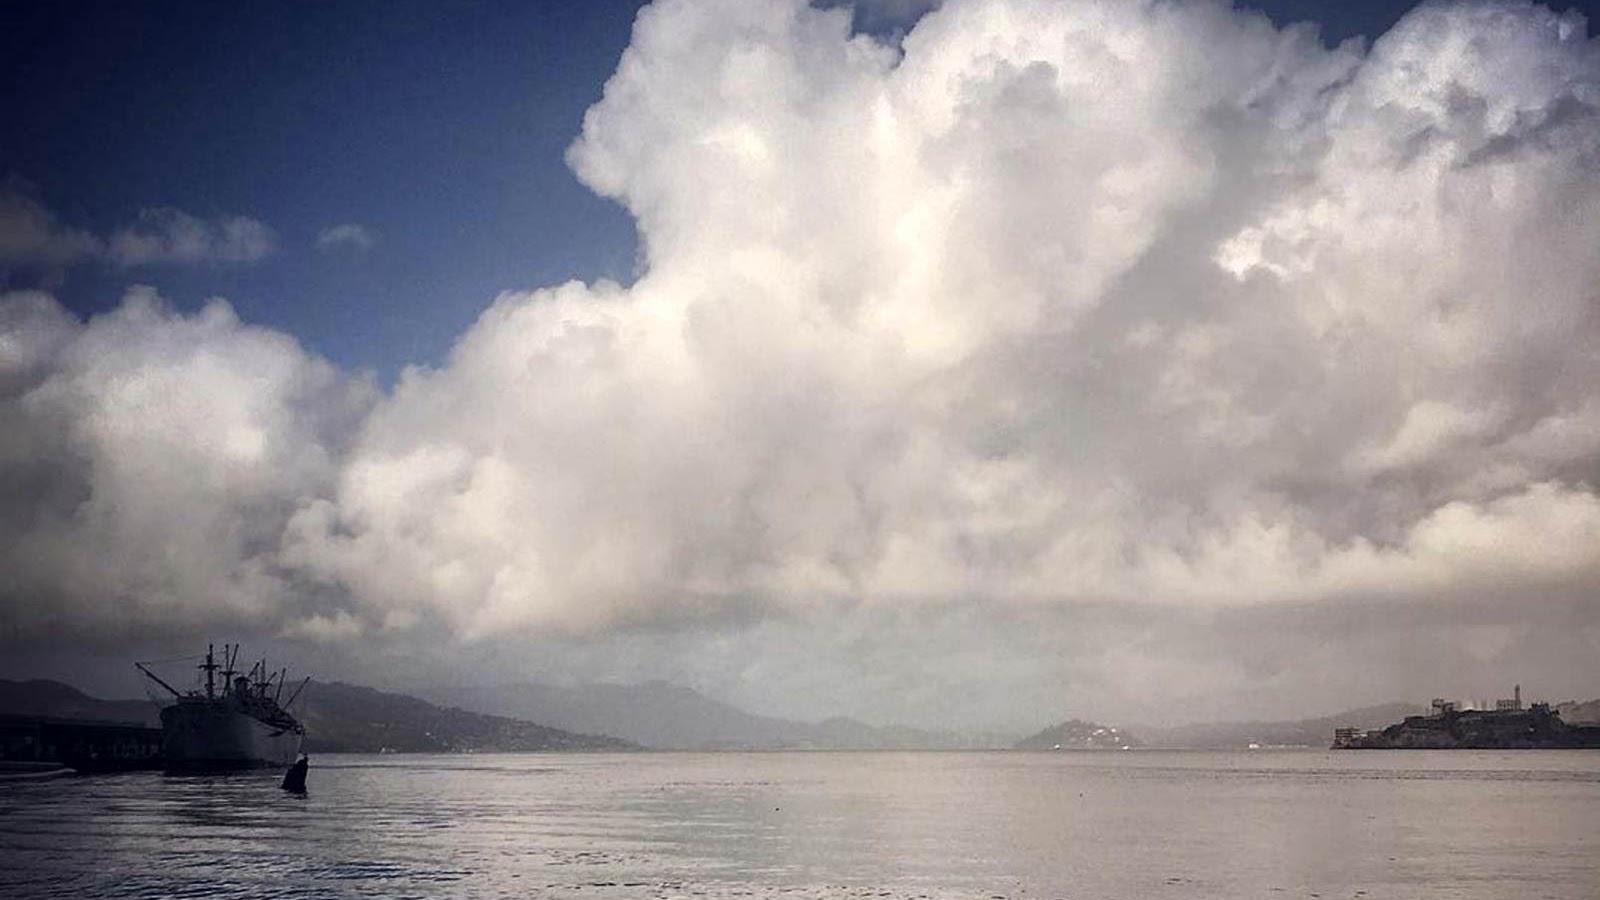 10 Gambar Wallpaper Gunung, Burung, Pantai, Kapal, Sunset Ukuran 1600x1080 Pixel Terbaru 2017